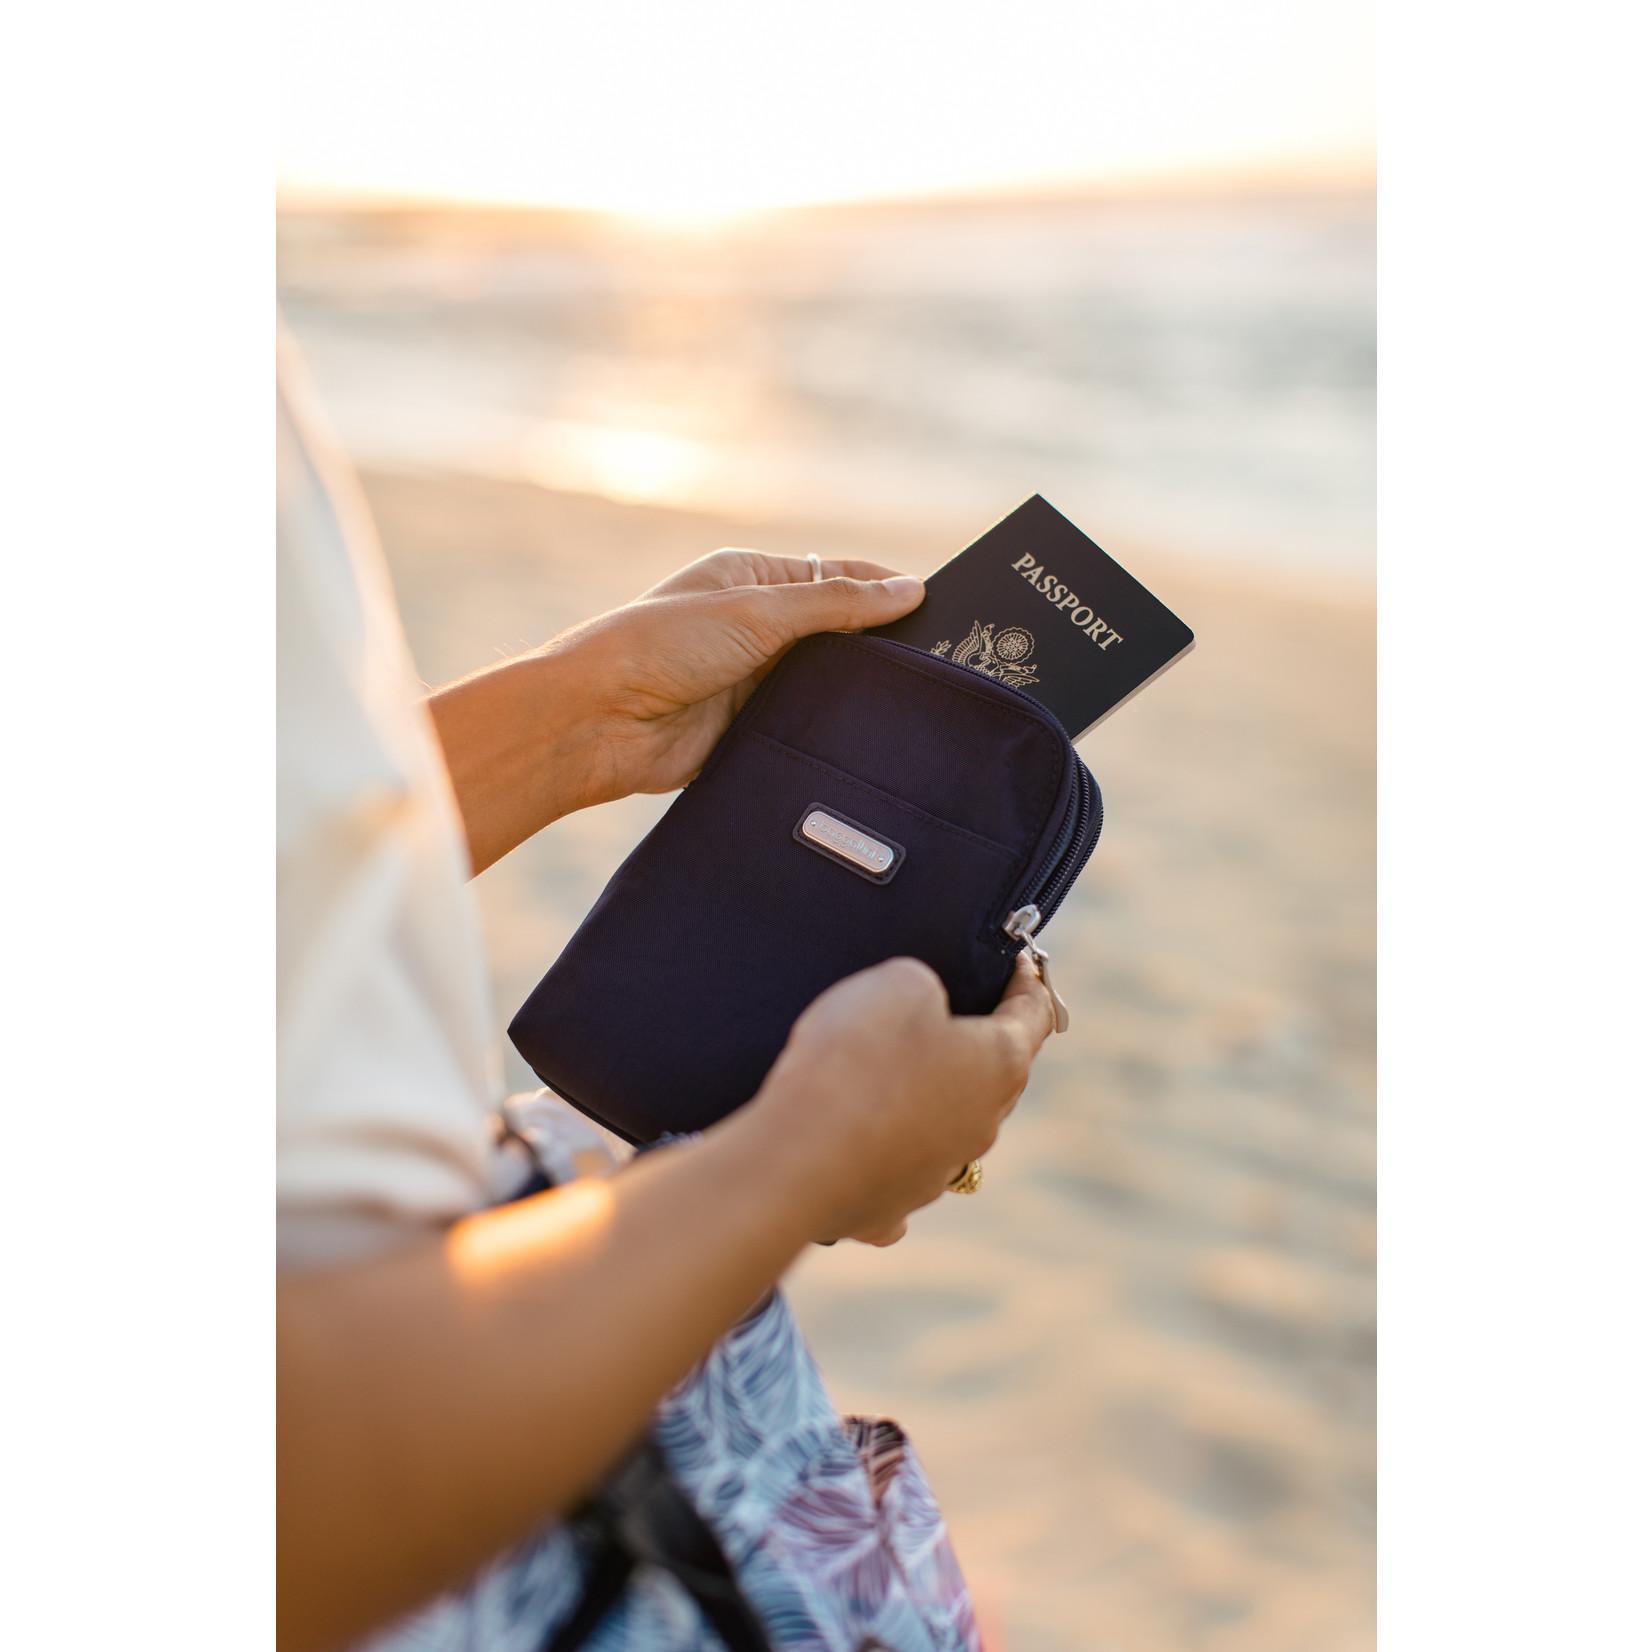 Baggallini Take Two RFID Bryant Crossbody - Portobello Shimmer